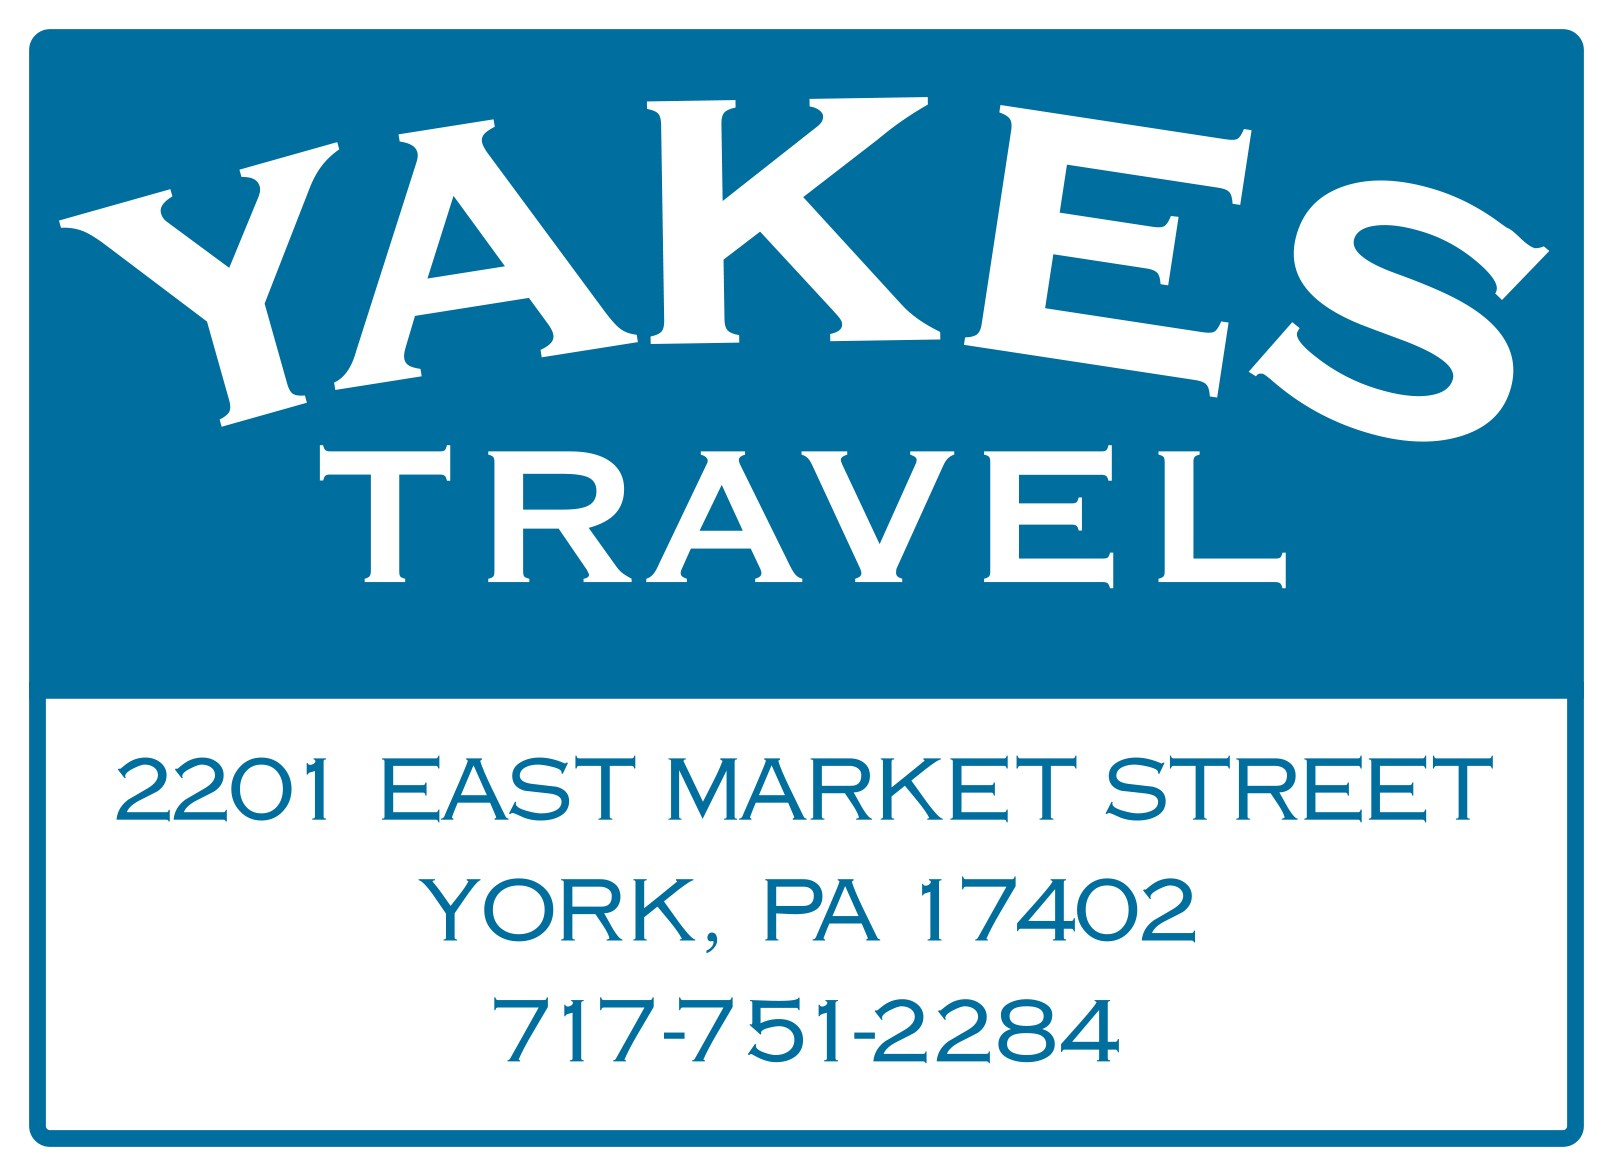 Yakes Travel